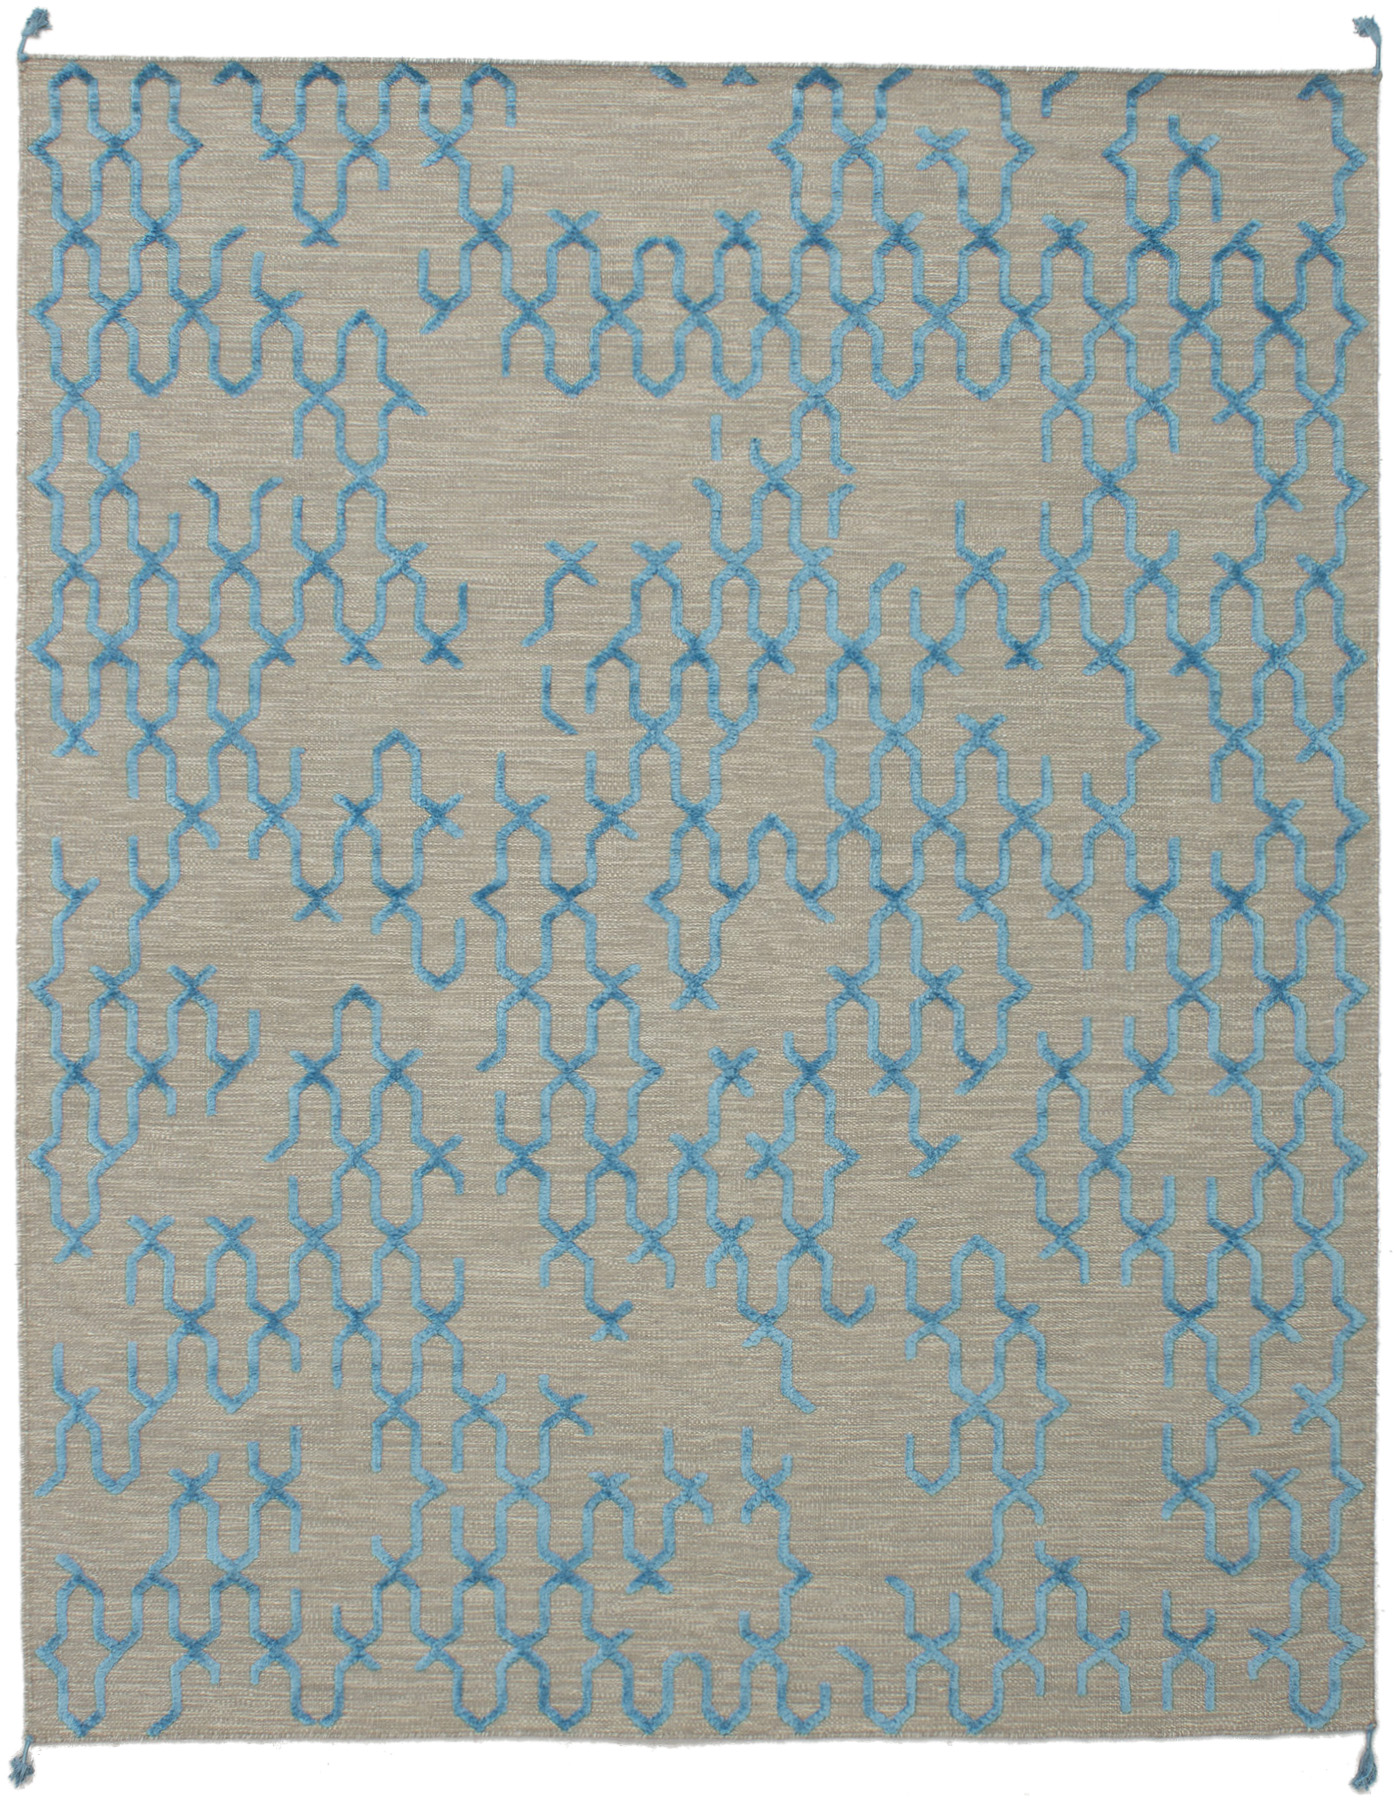 "Hand woven Kalista Light Khaki, Sky Blue Wool/Silk Kilim 7'10"" x 9'10"" Size: 7'10"" x 9'10"""